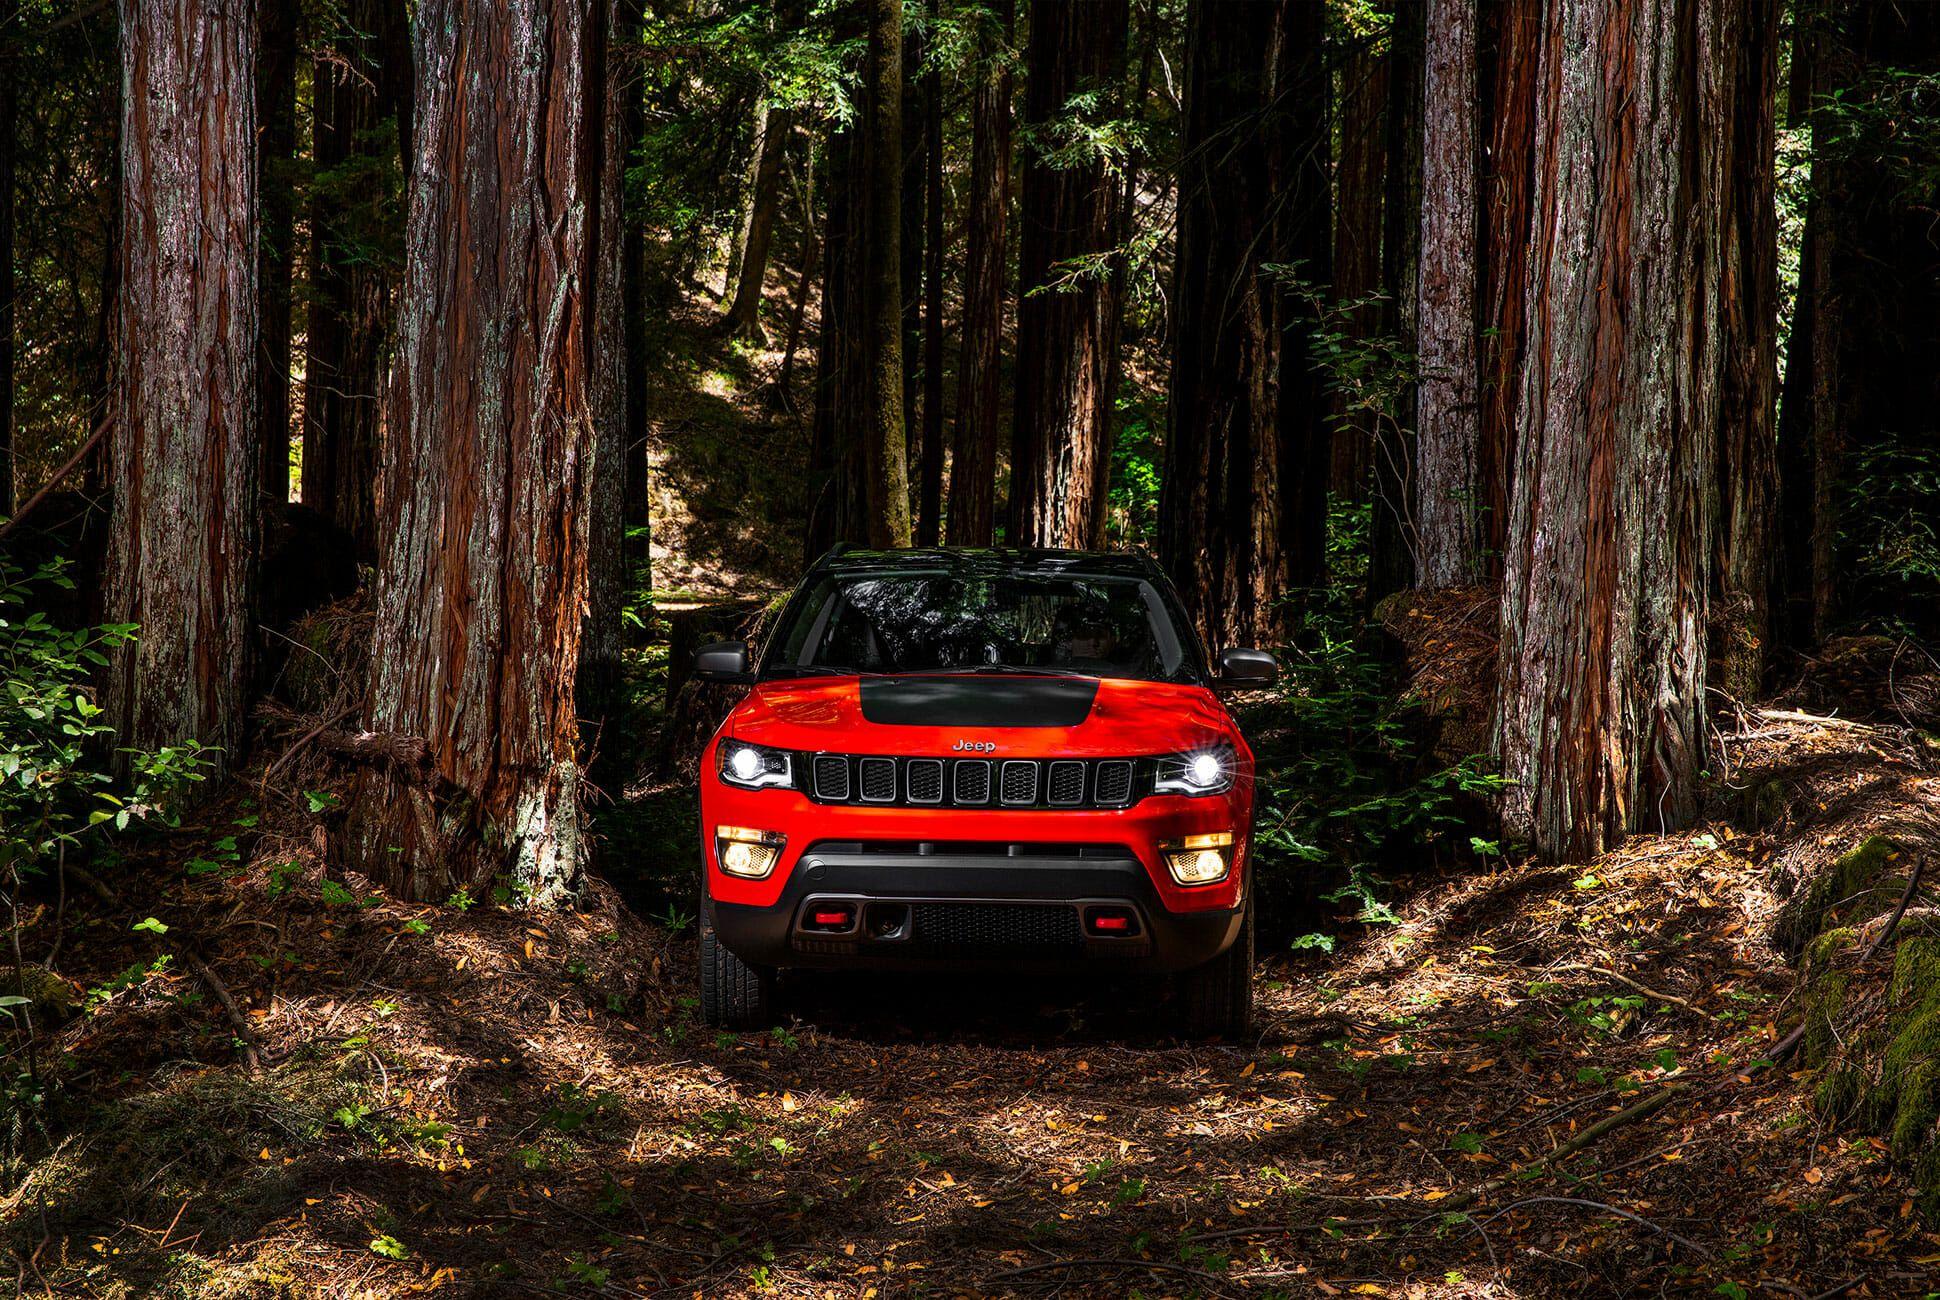 Jeep-Compass-Review-Gear-Patrol-slide-2